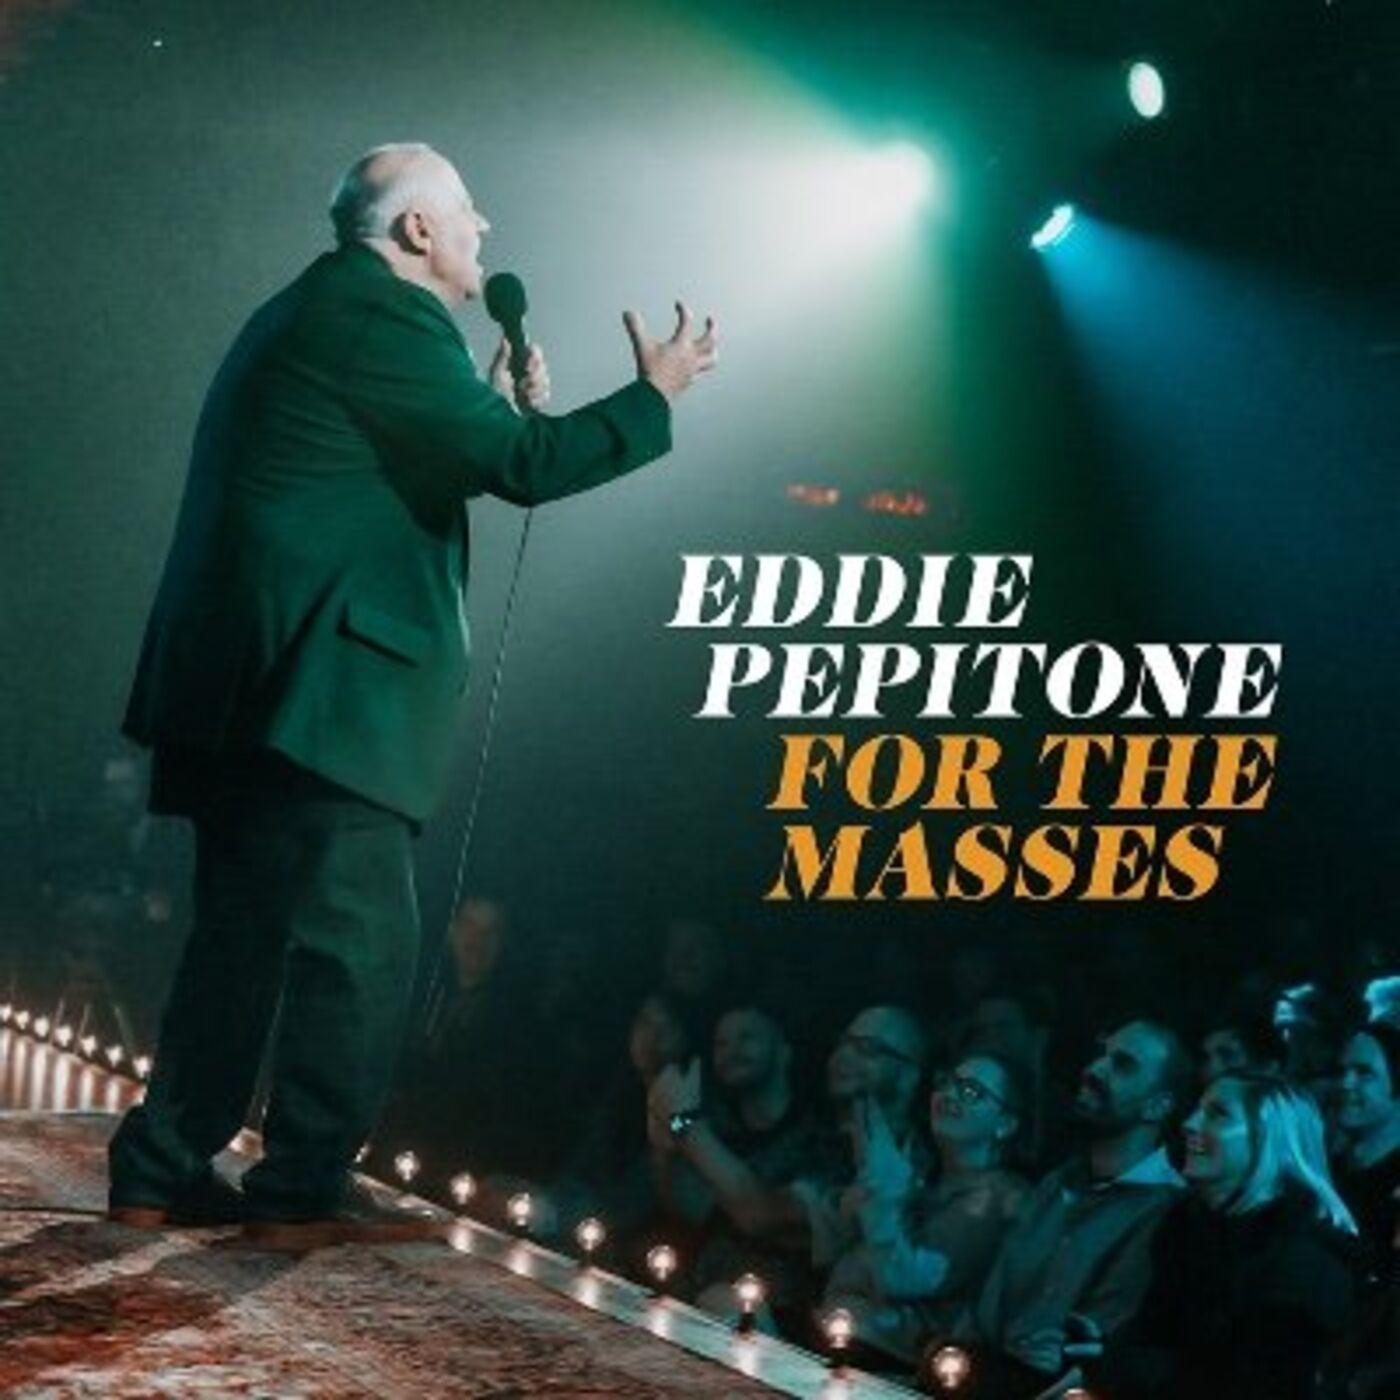 Episode 103: Eddie Pepitone